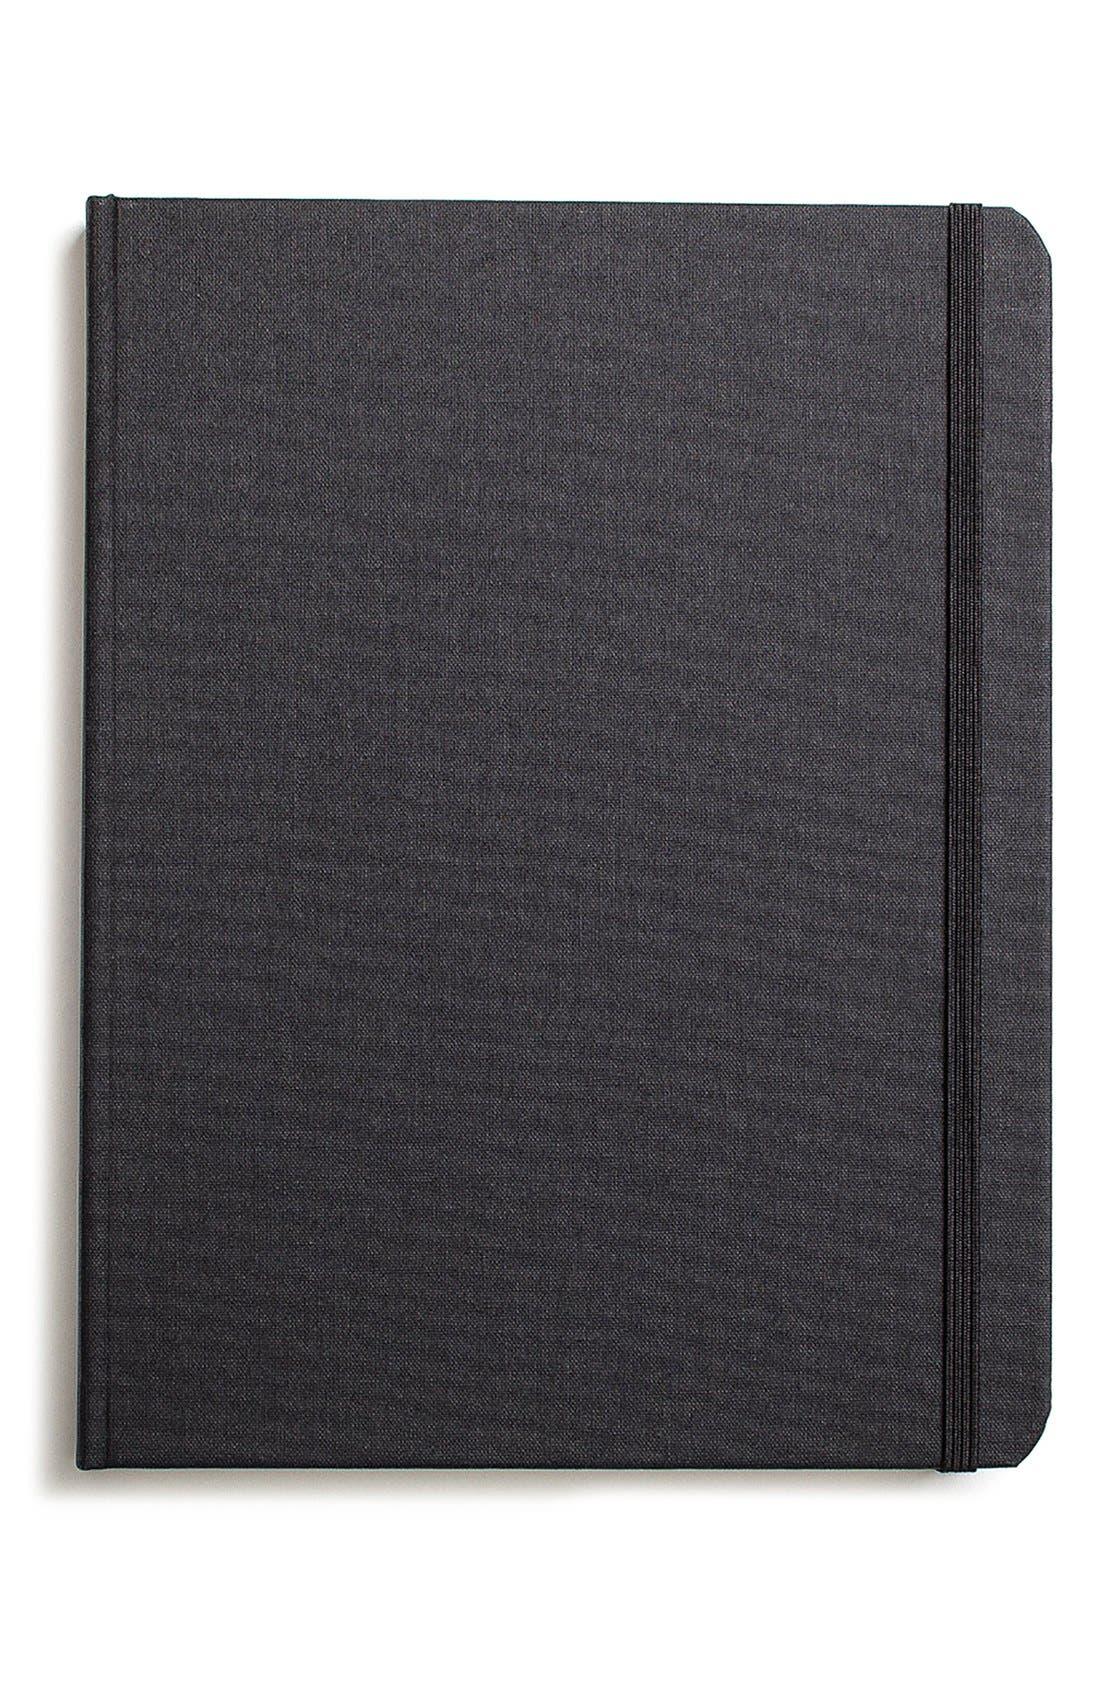 Hardcover Linen Journal,                             Main thumbnail 1, color,                             Jet Black